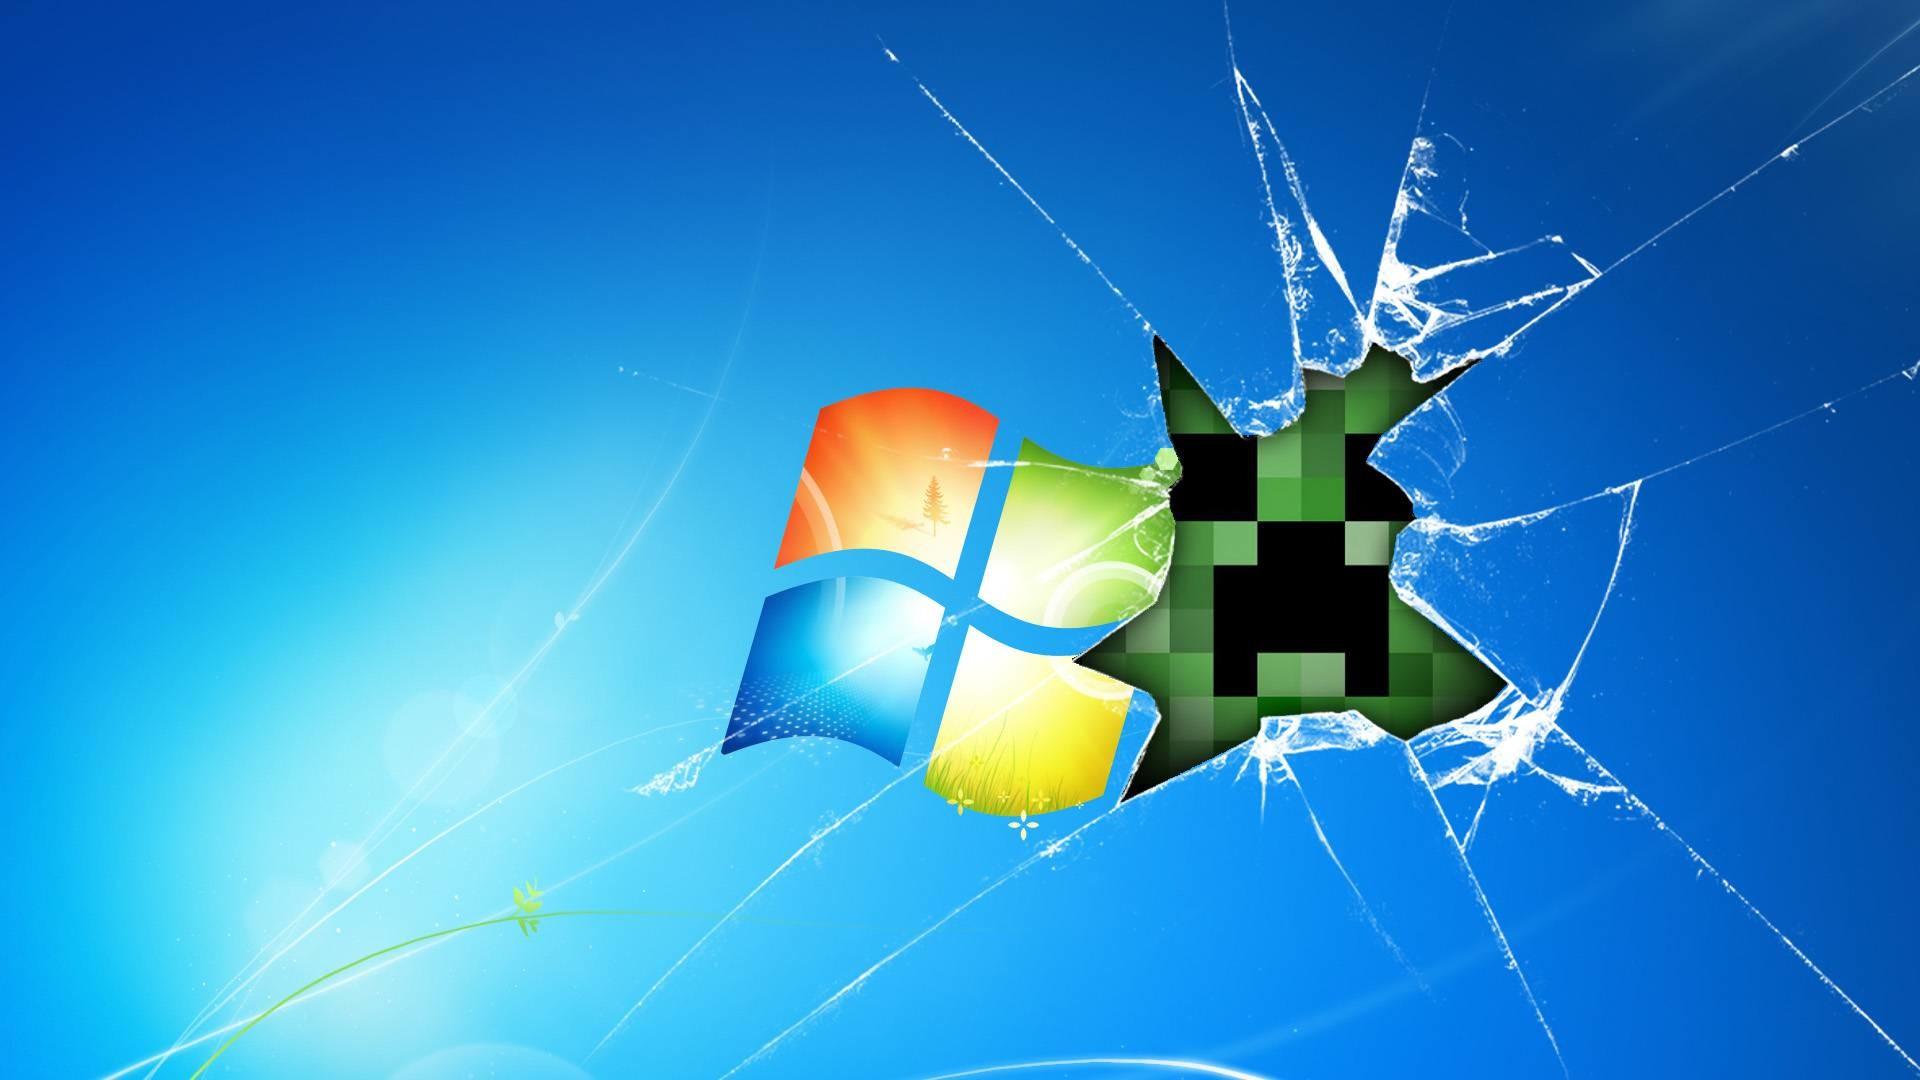 Live desktop wallpaper windows 7 free download